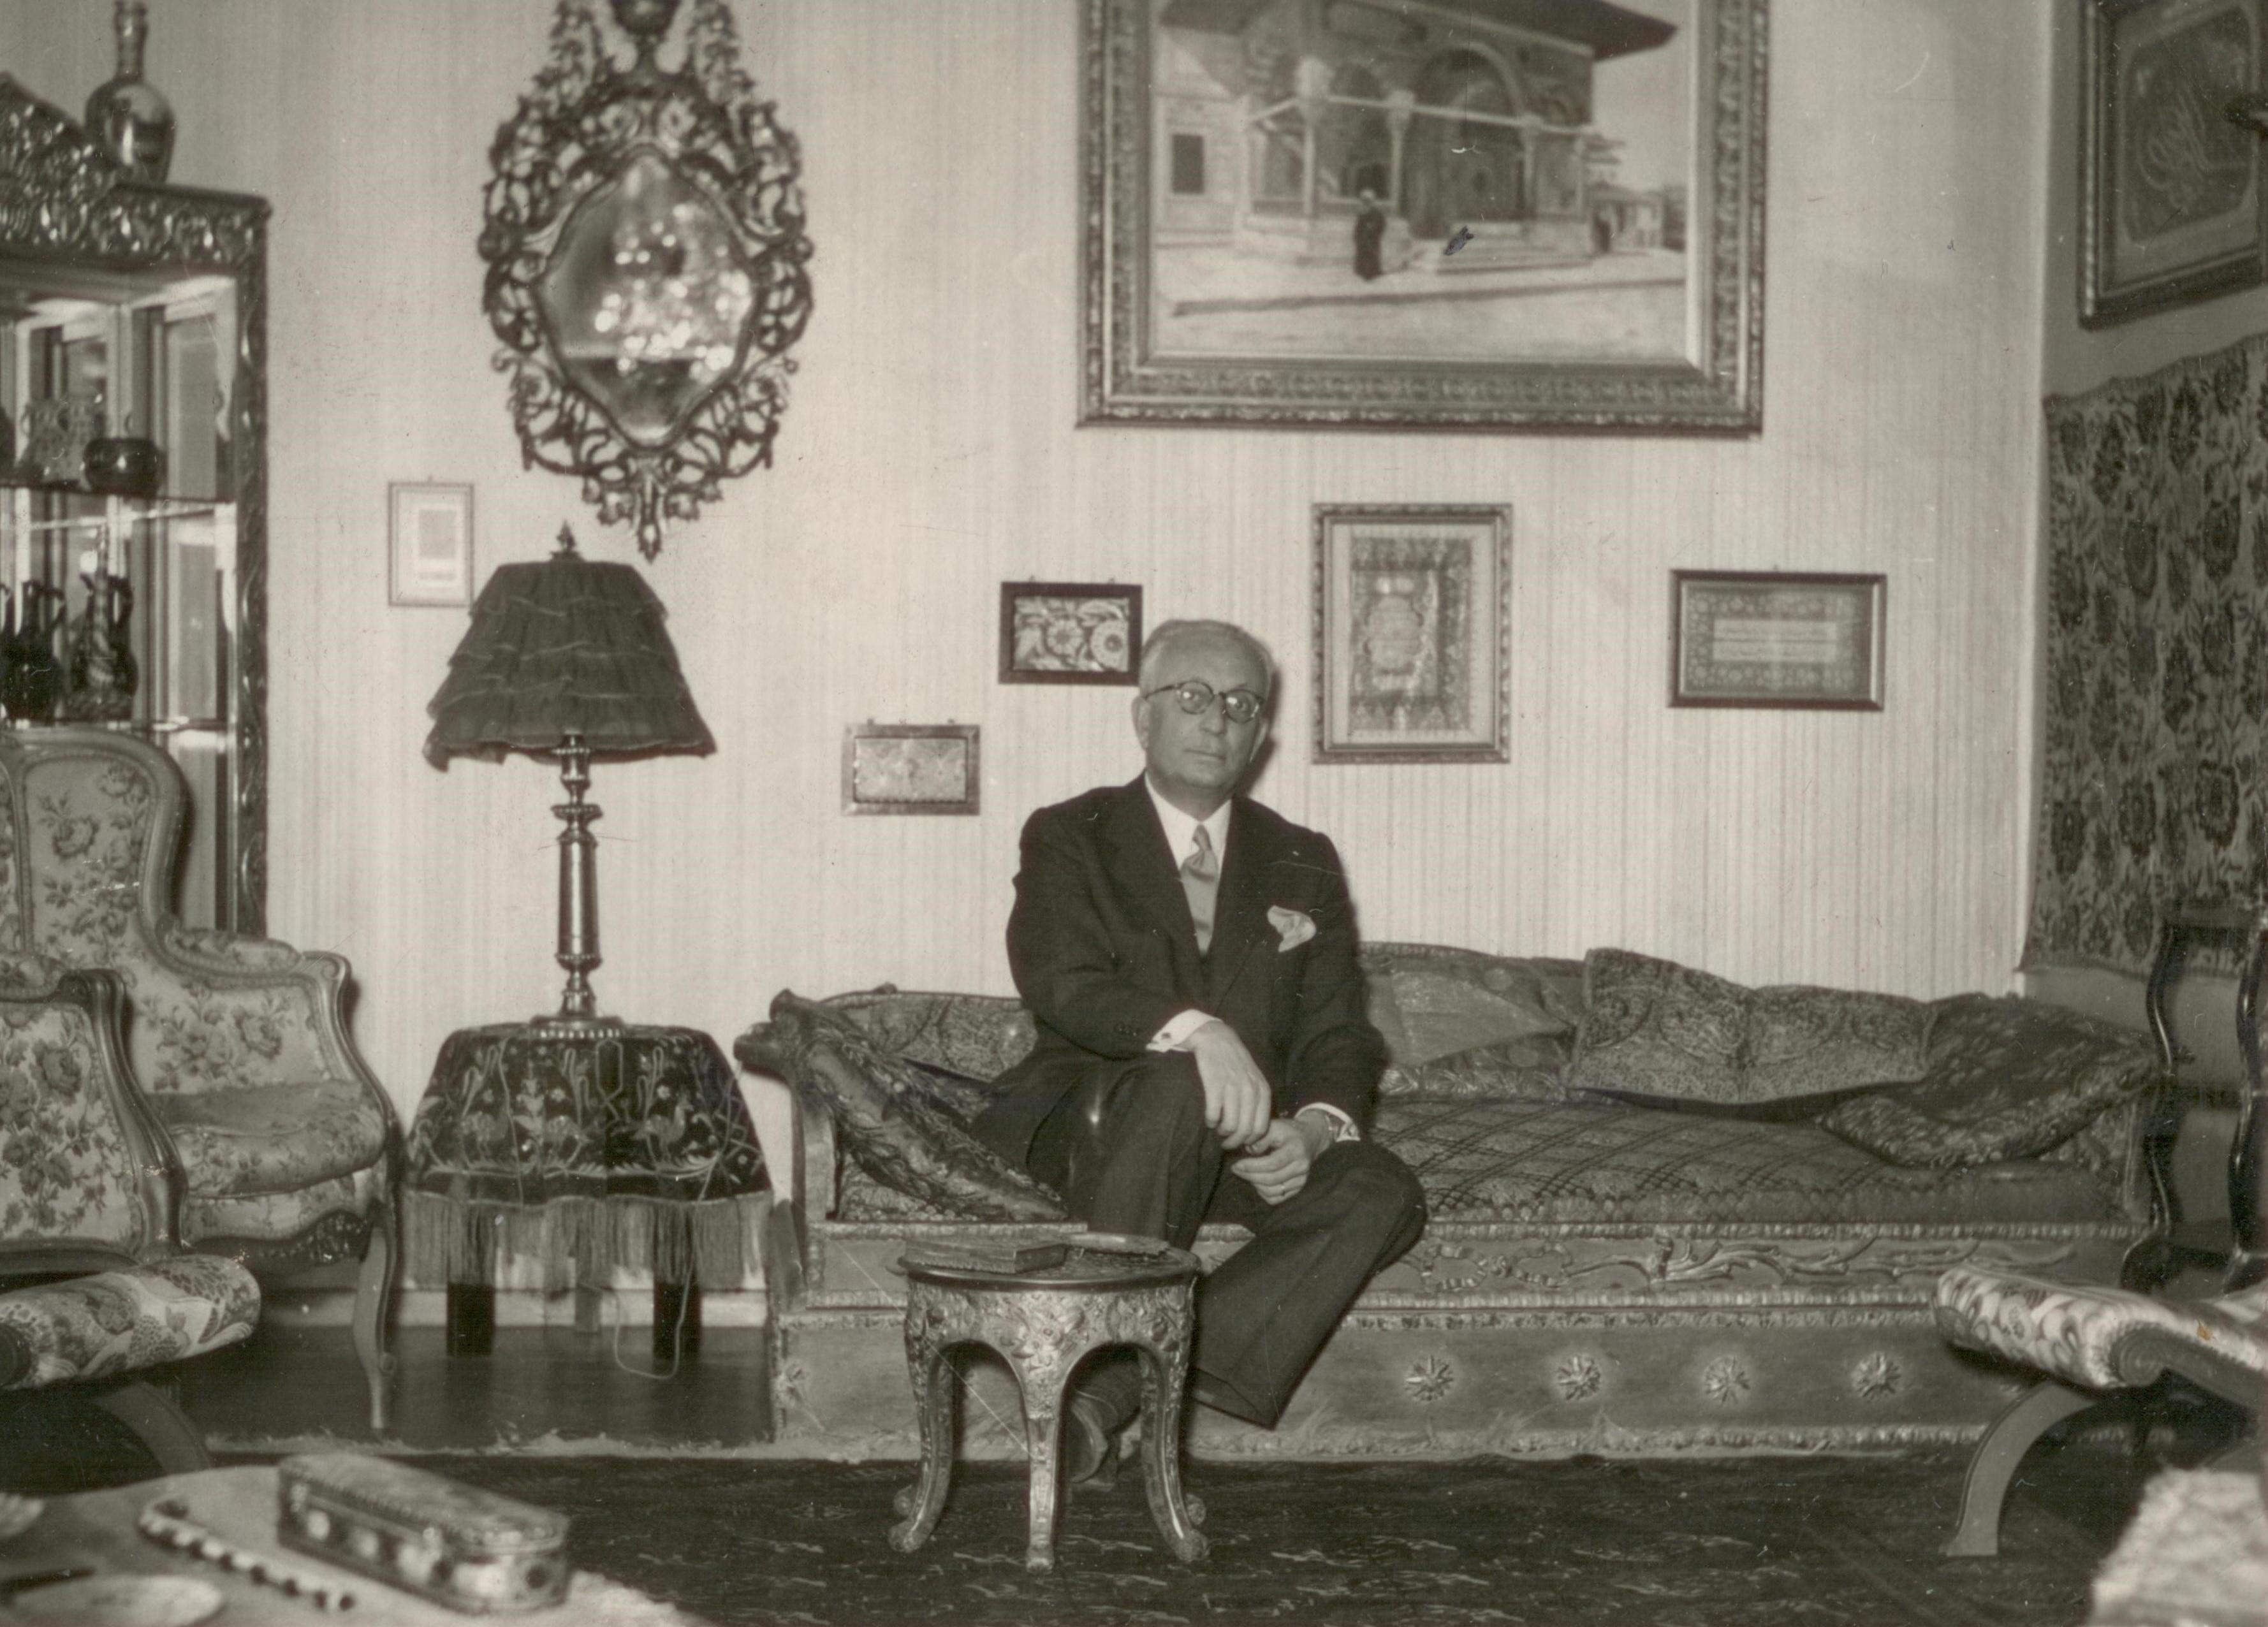 Ekrem Hakkı Ayverdi in the living room of his home in Fatih